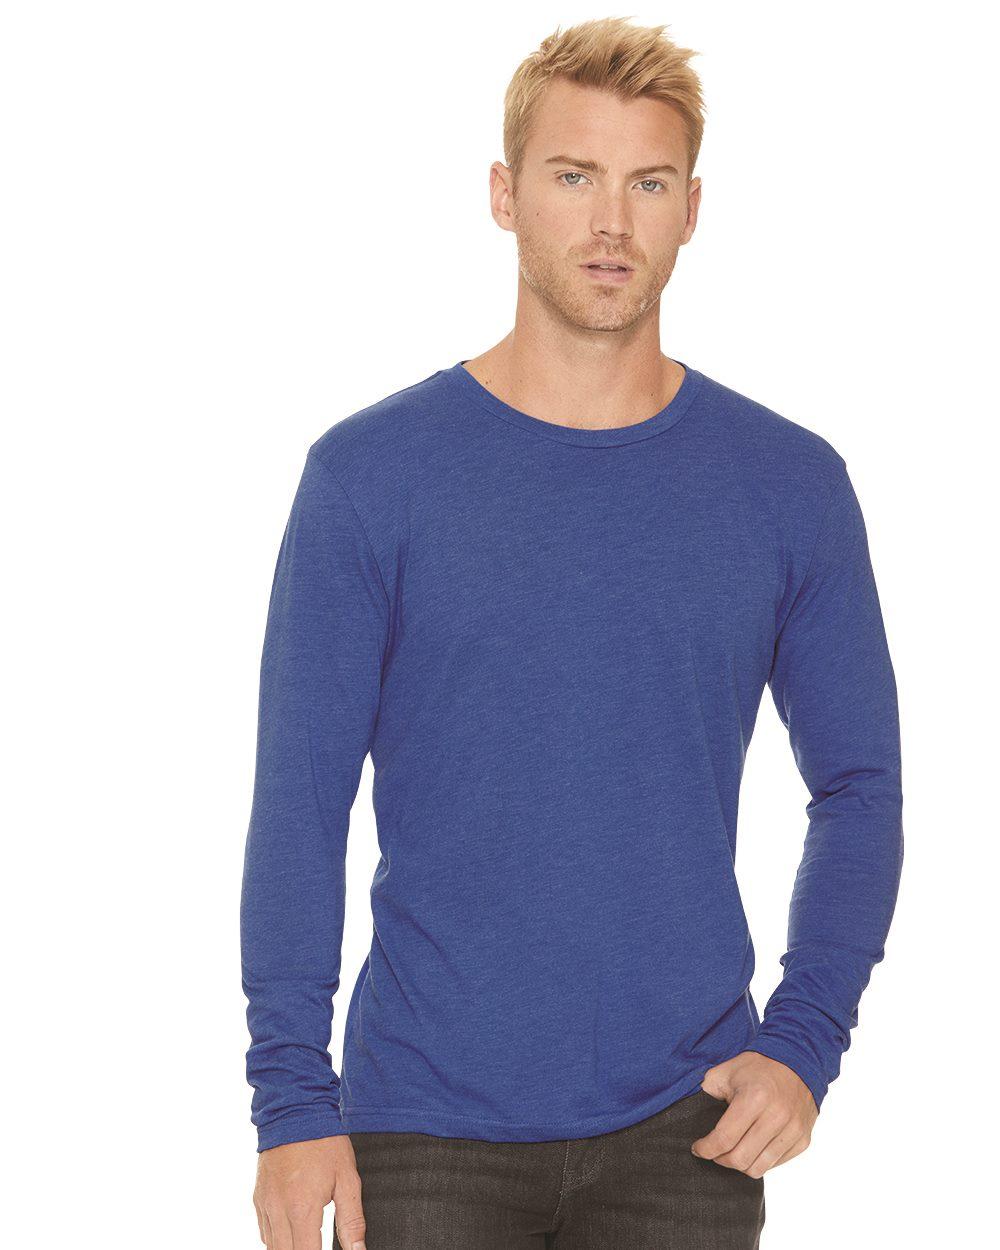 e16e62ec9b46 Tagless T-shirts - shirtcotton.com